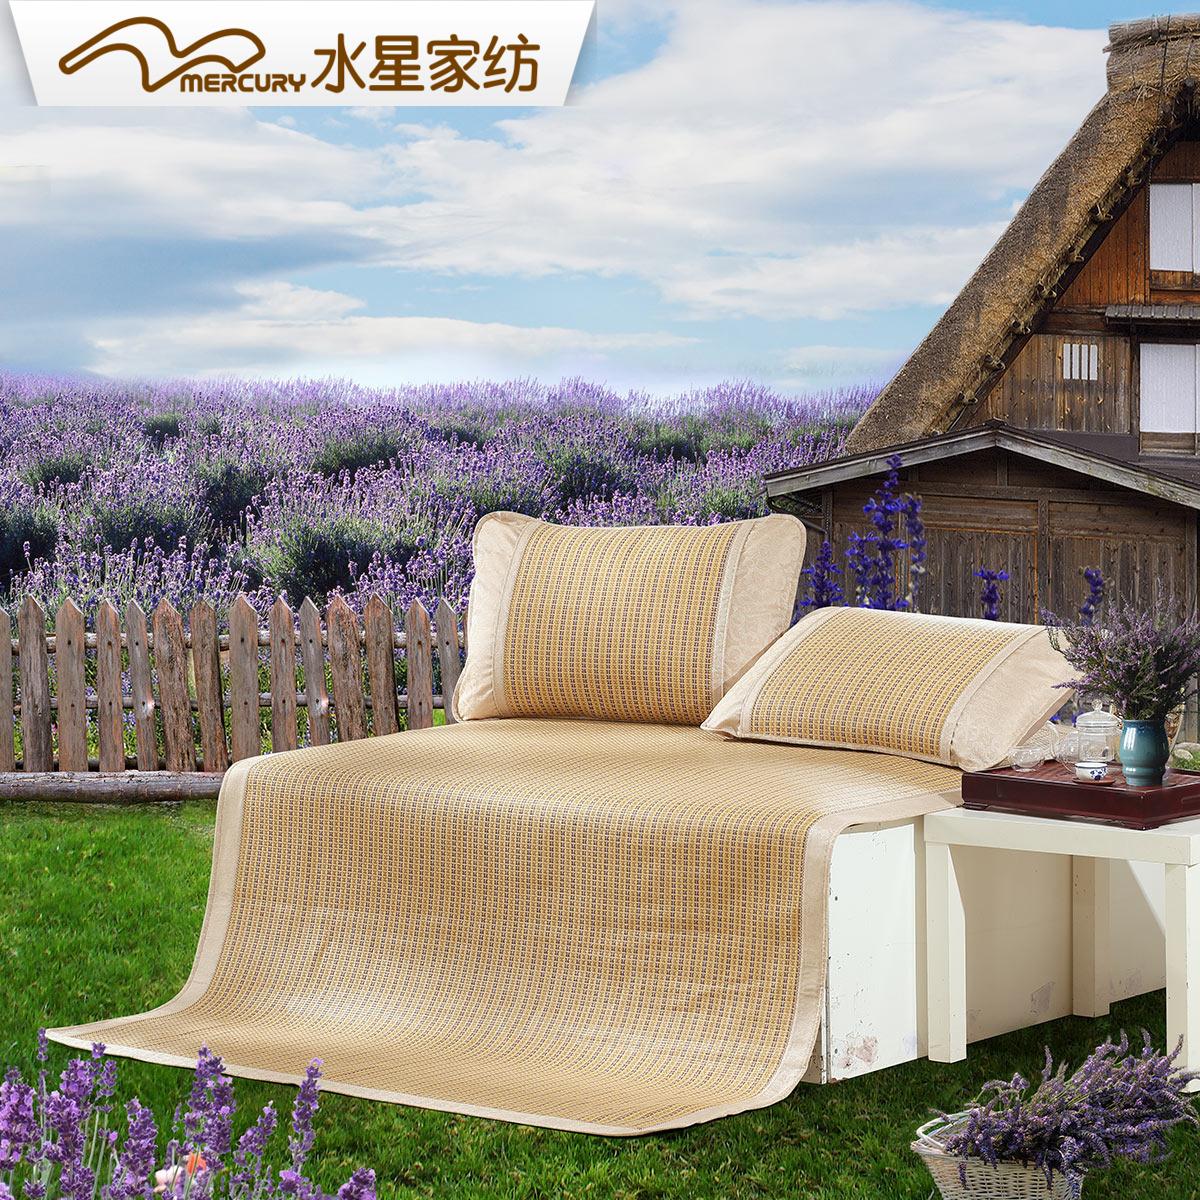 Декоративные одеяла и подушки / Прикроватные коврики Артикул 595348949515